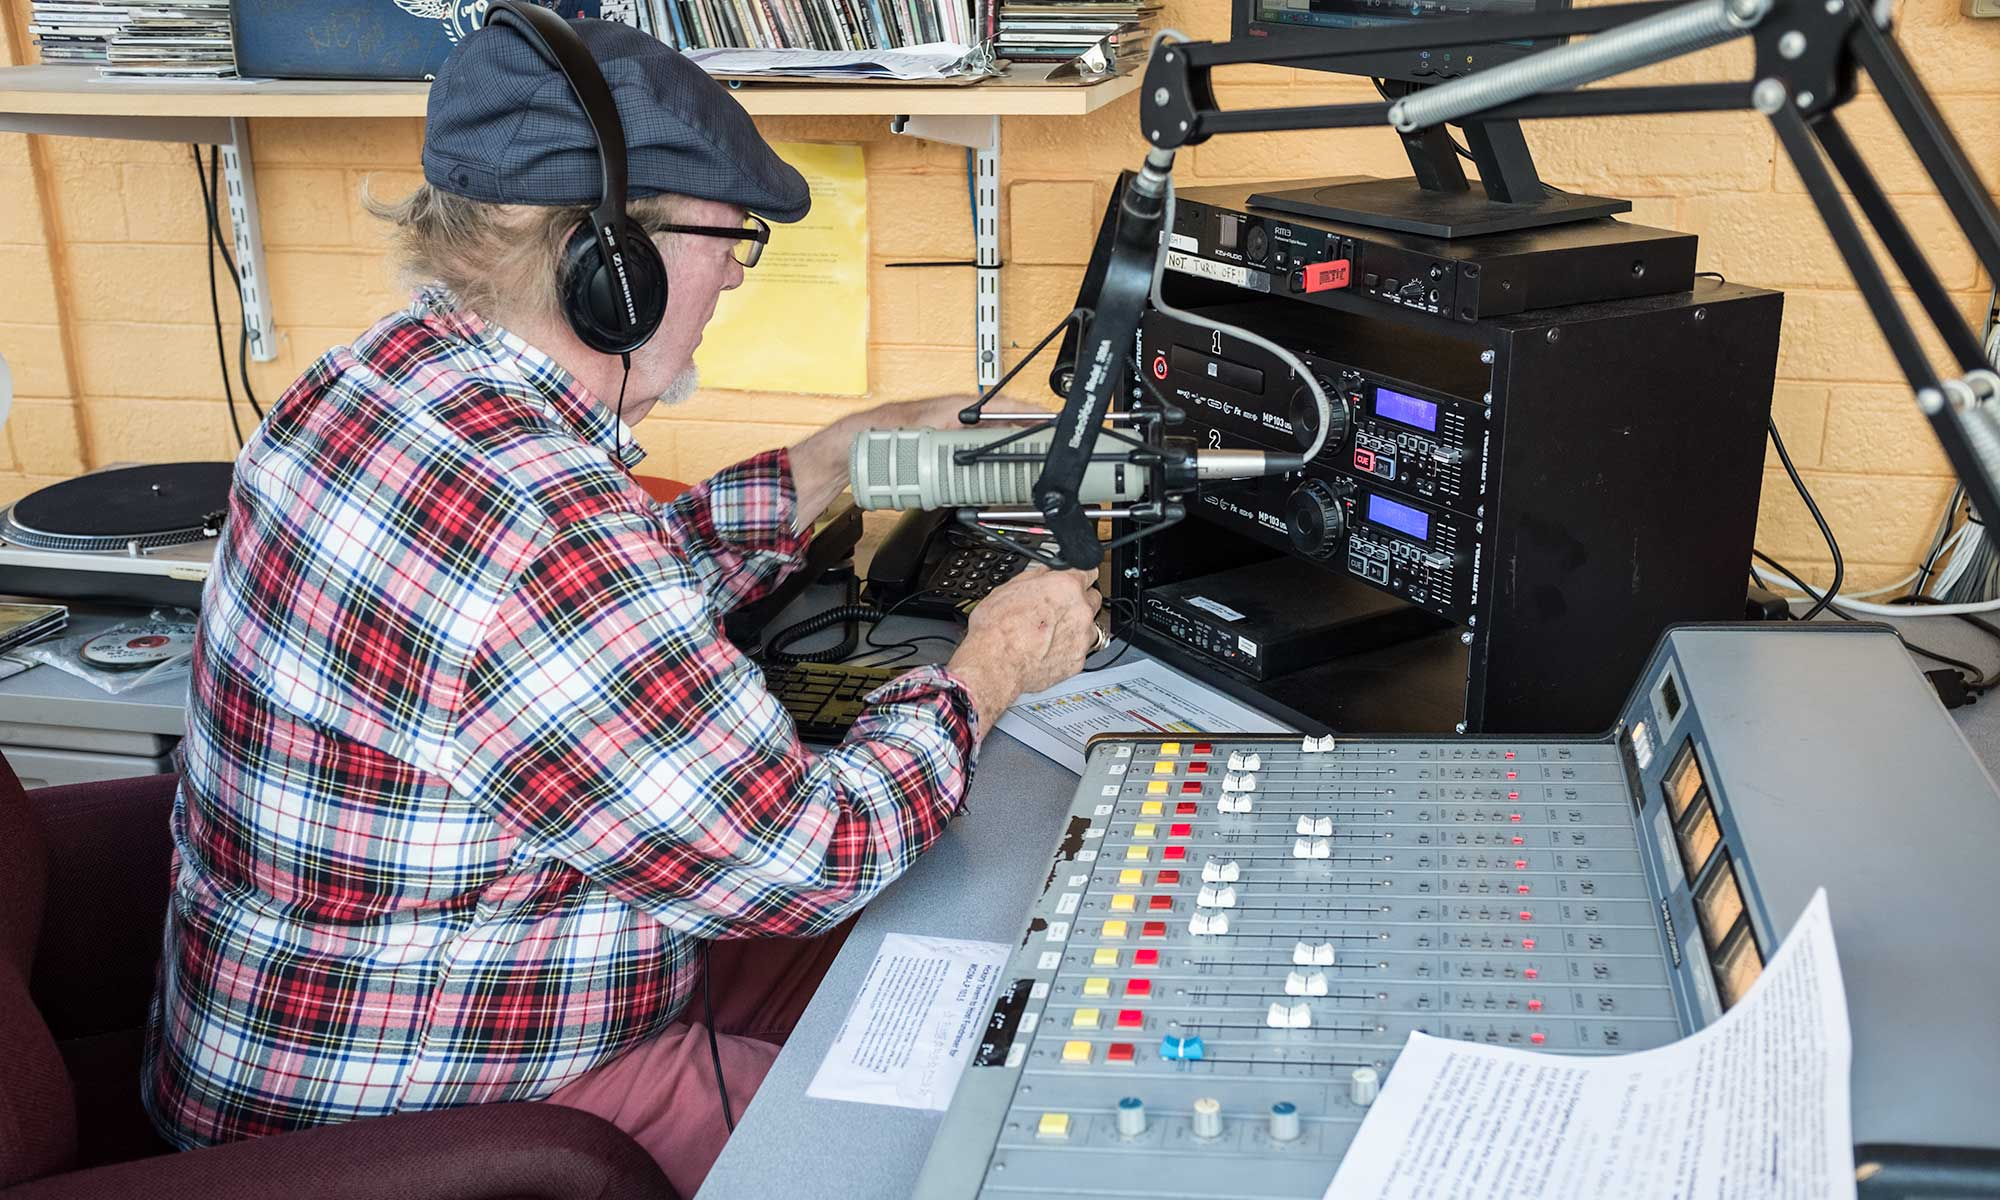 WCOM-LP 103.5 FM